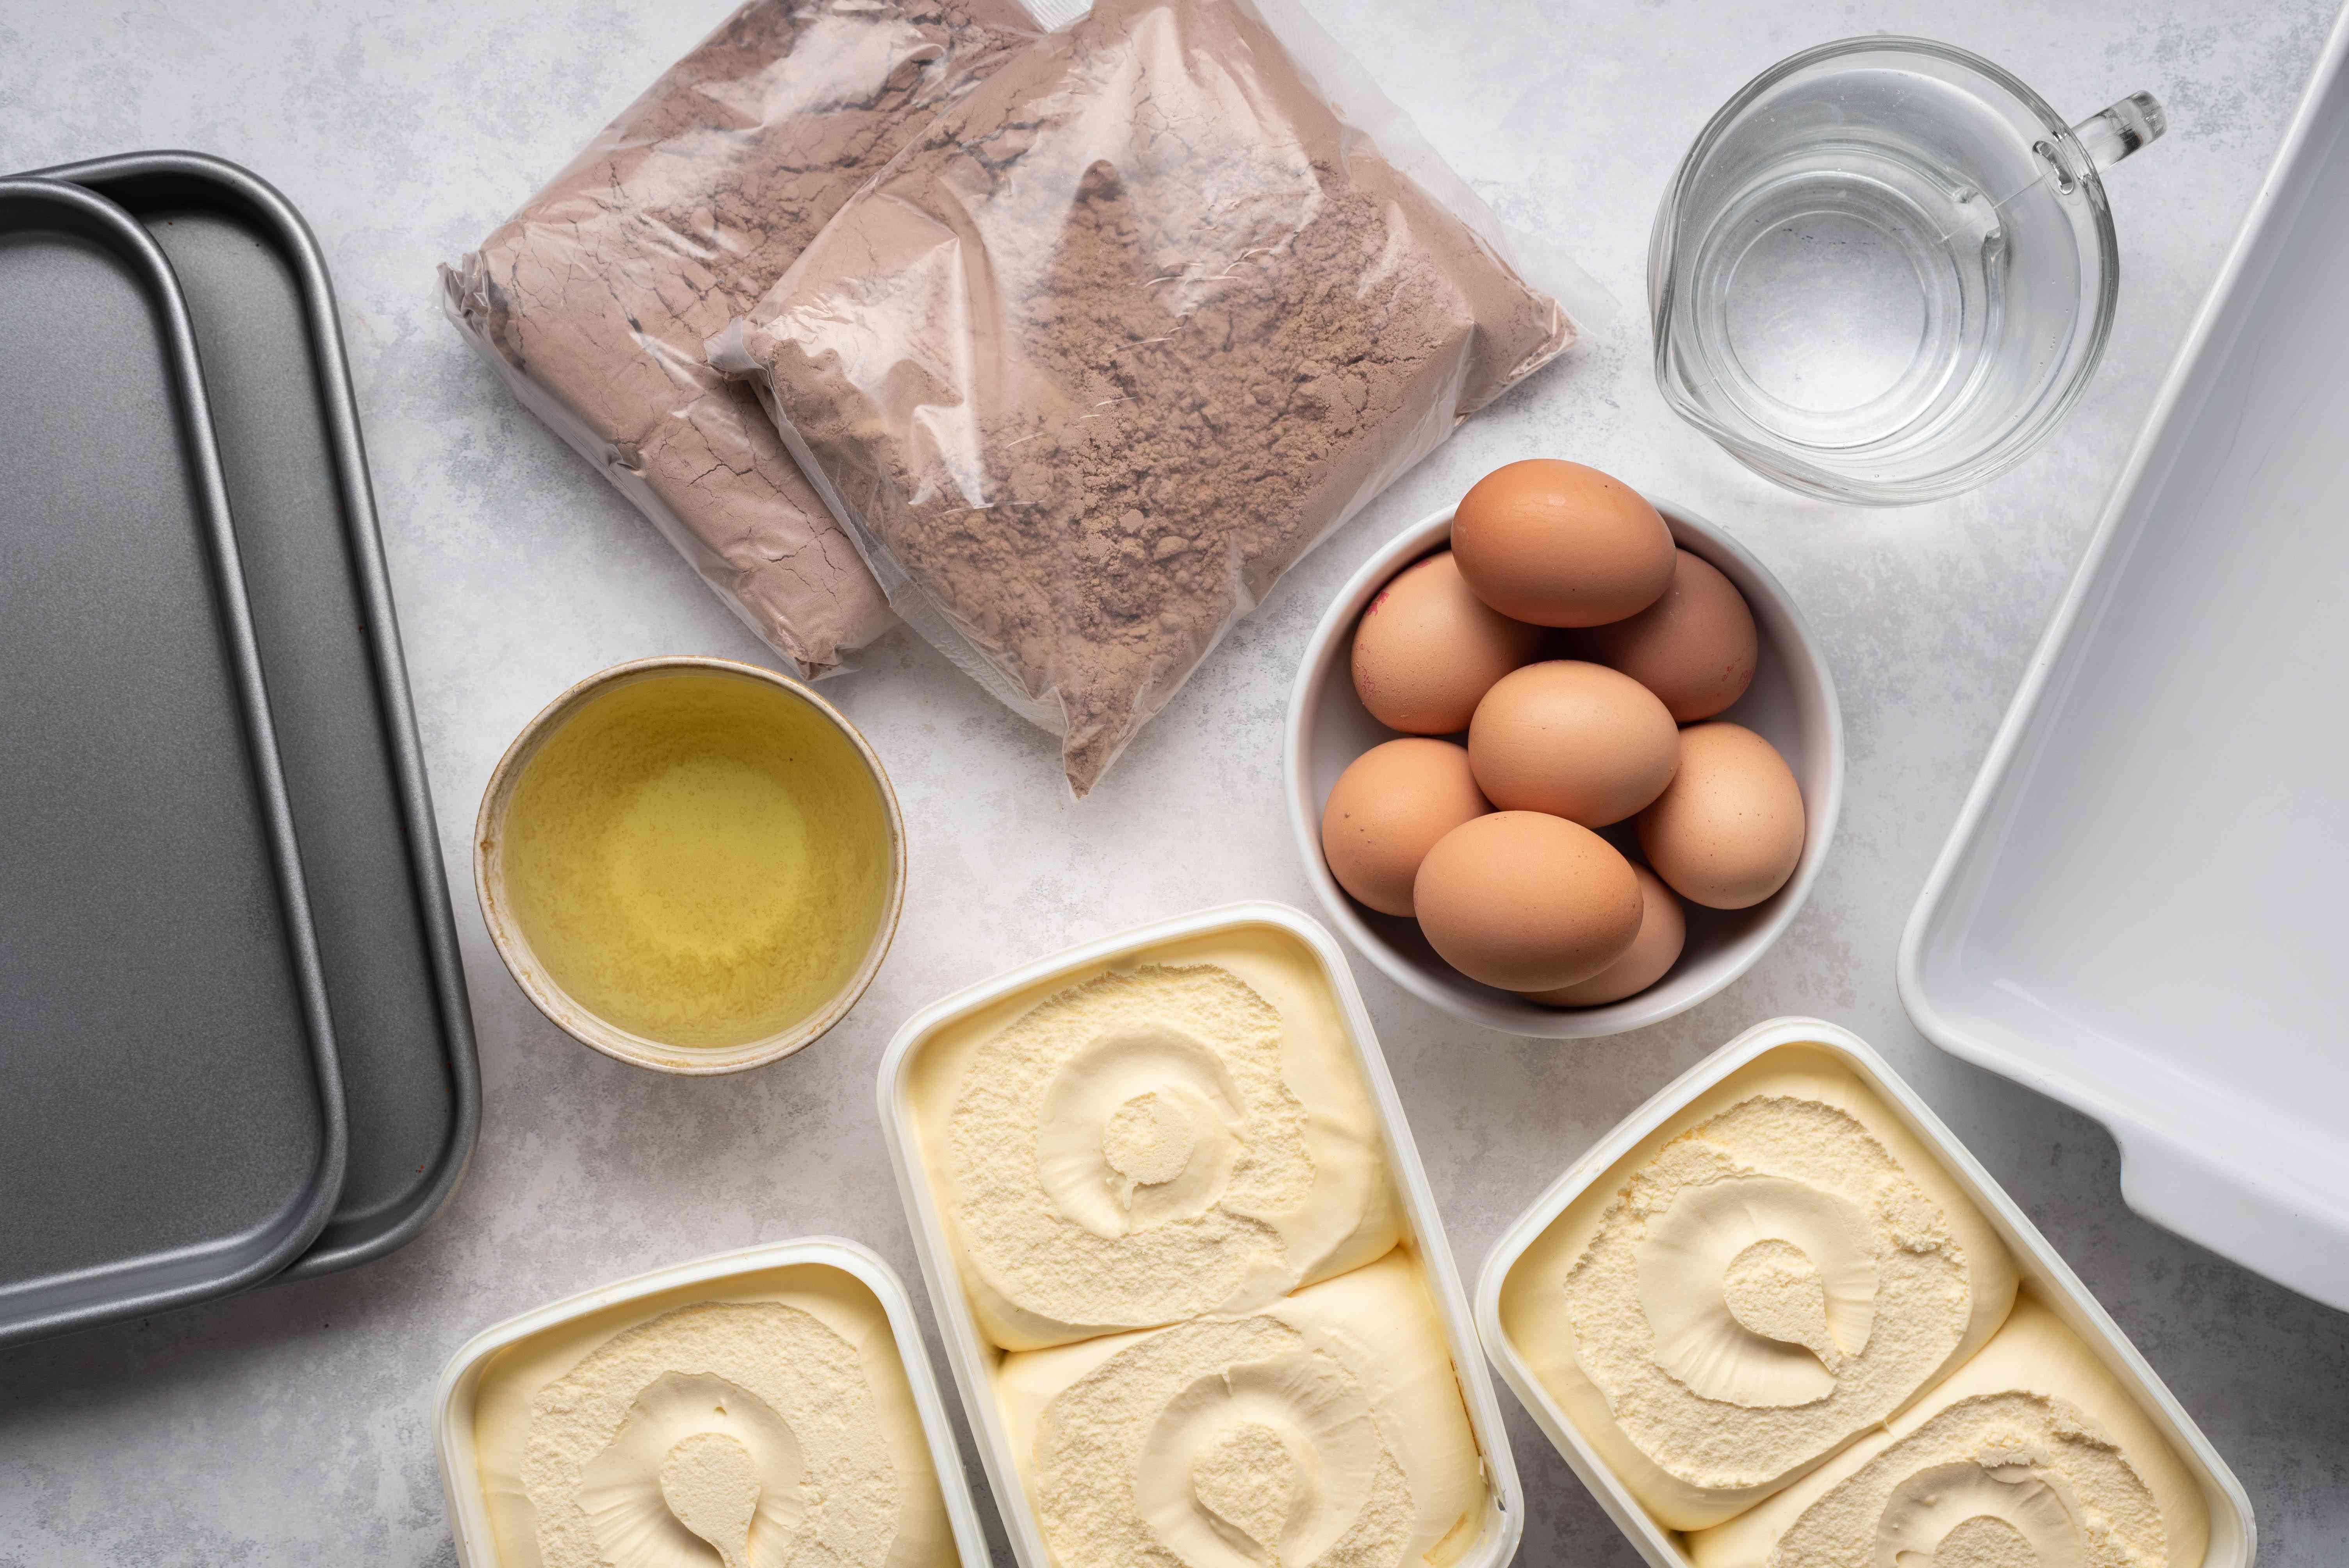 Giant Ice Cream Sandwich ingredients